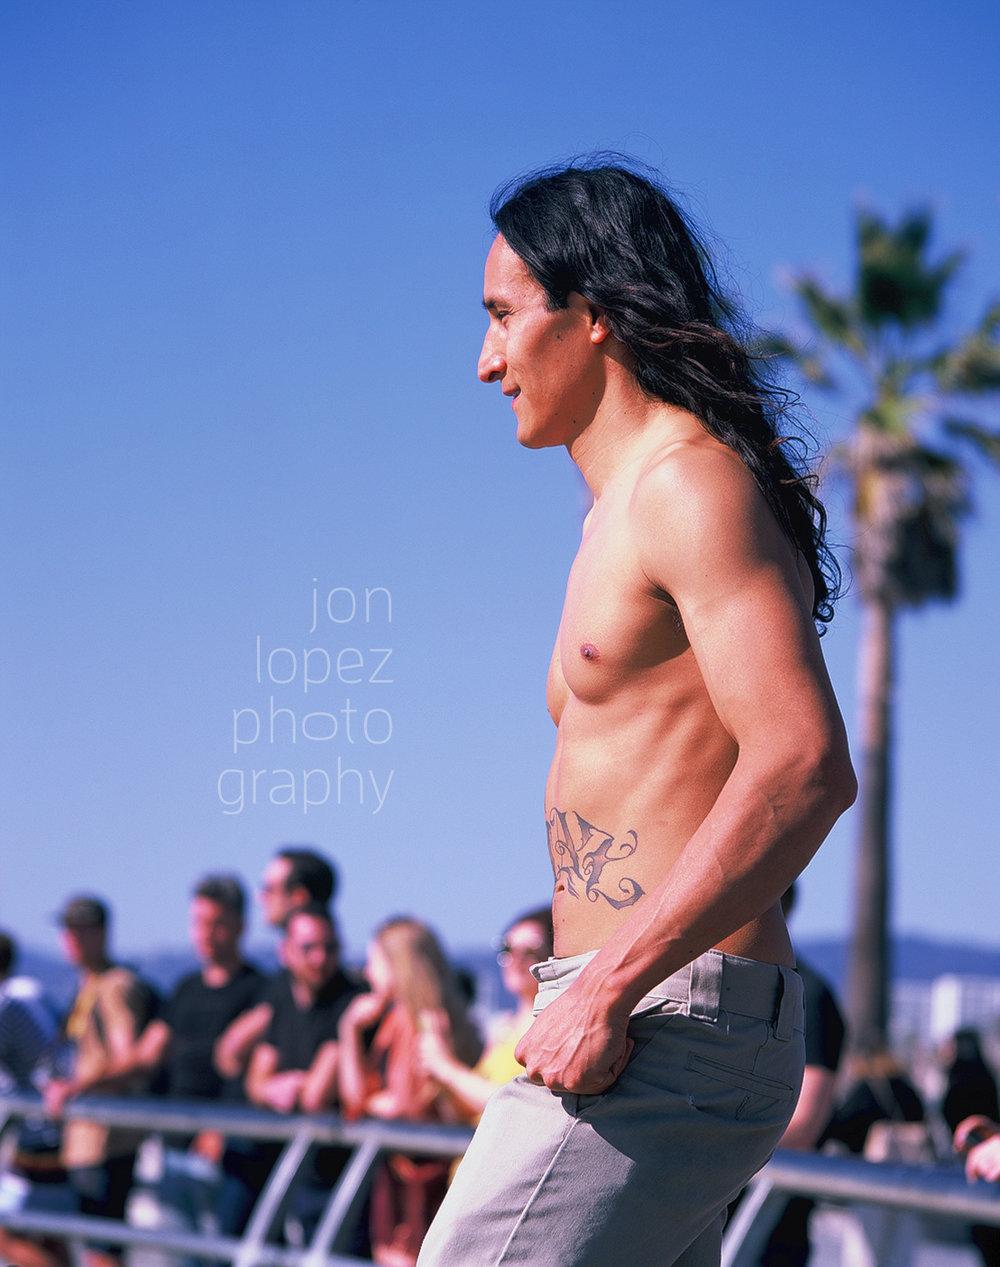 Skateboarder at Venice Beach photographed on Fuji Provia 100.